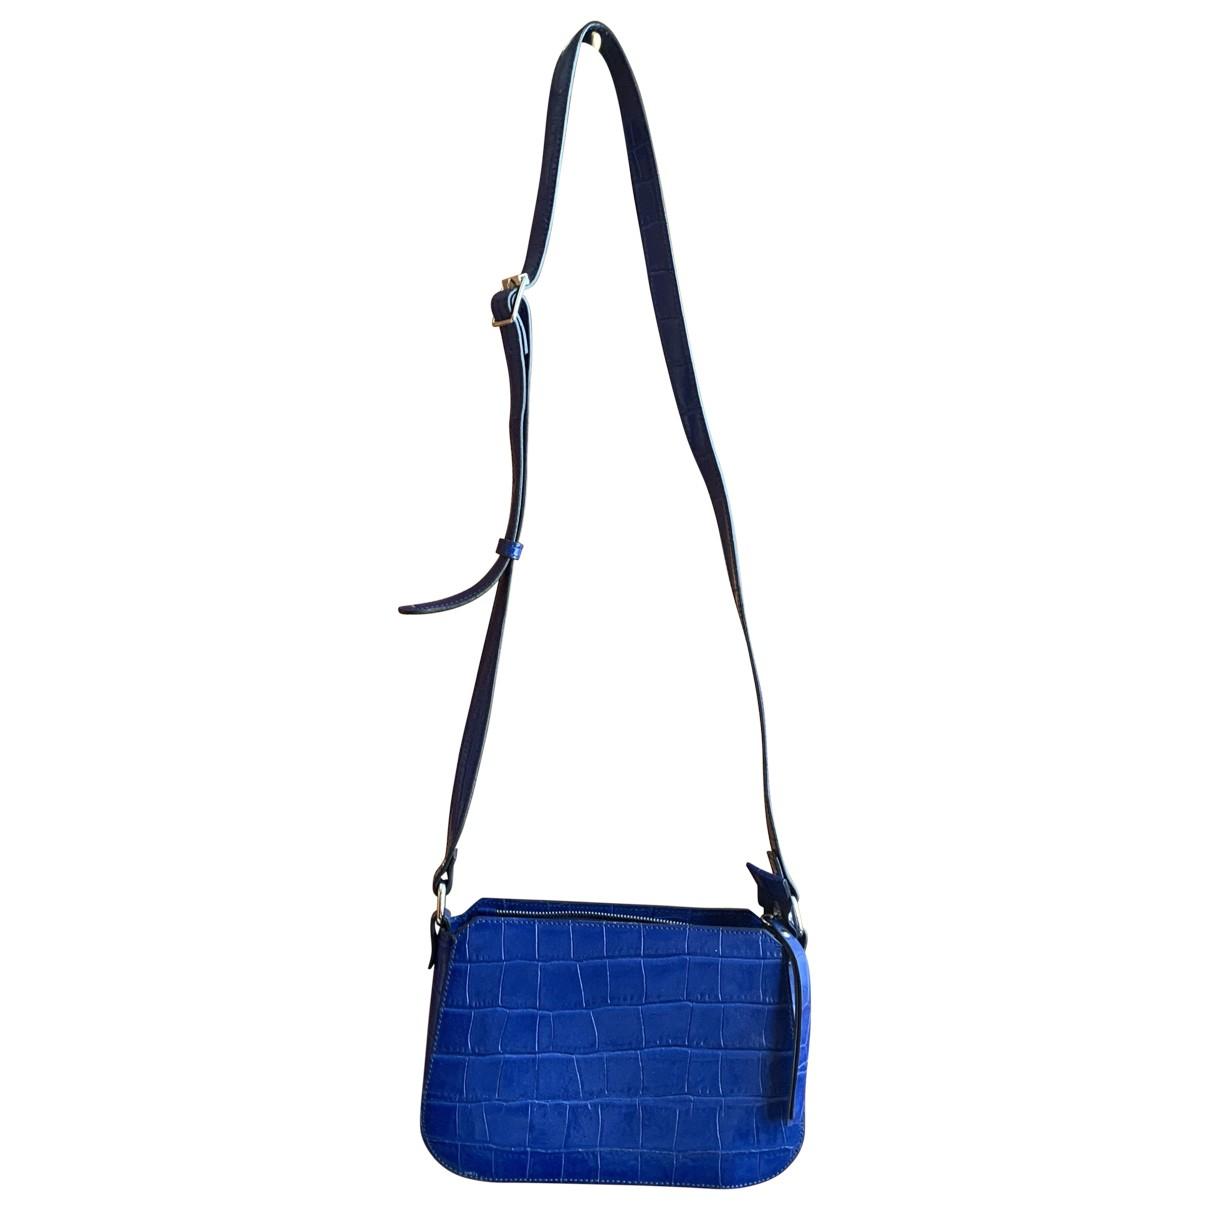 Baldinini \N Blue Leather handbag for Women \N